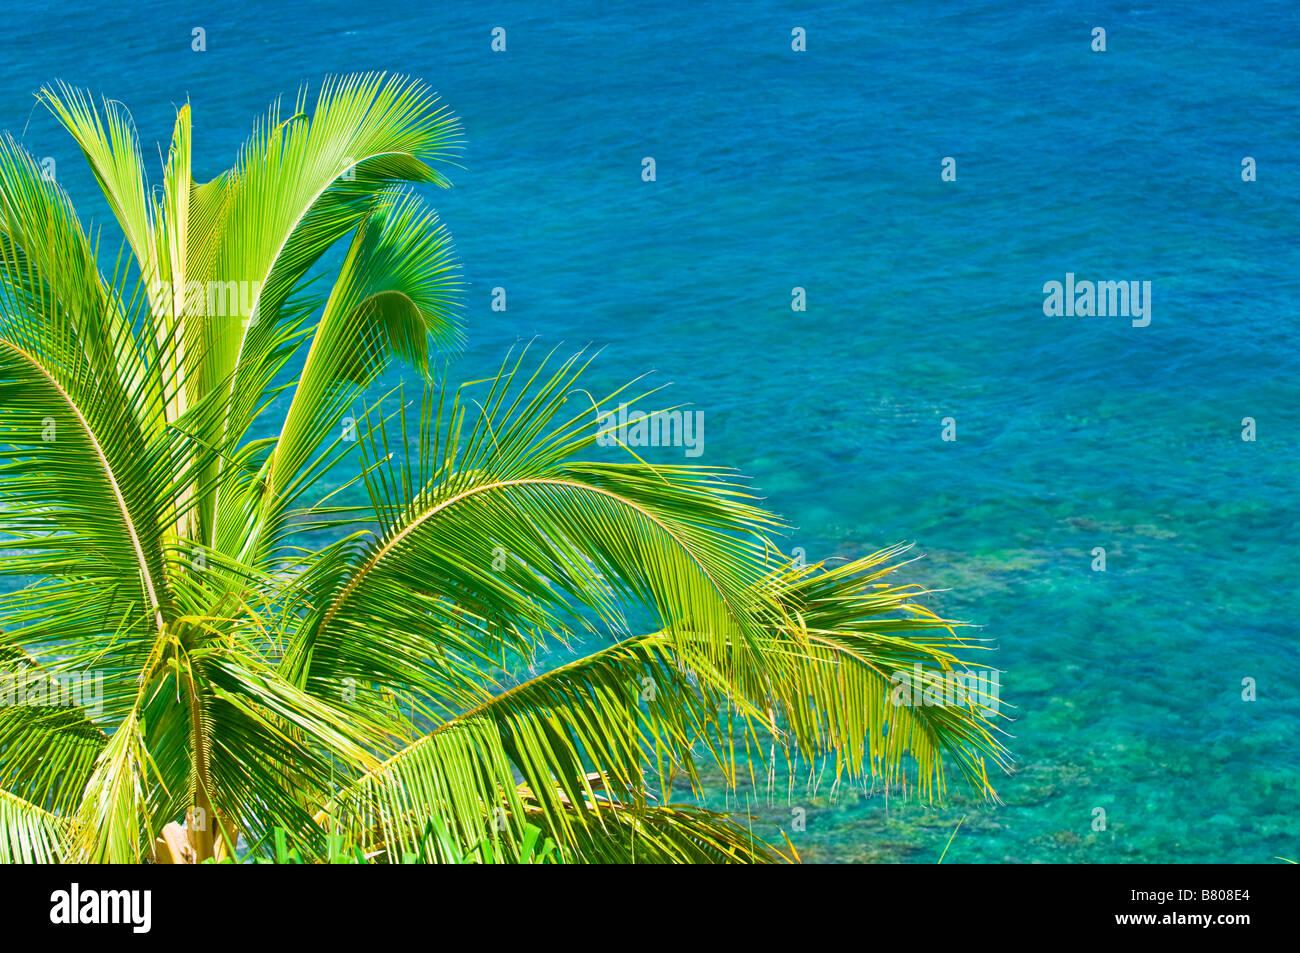 Coconut palm and blue Pacific water at Hideaways Beach Island of Kauai Hawaii - Stock Image